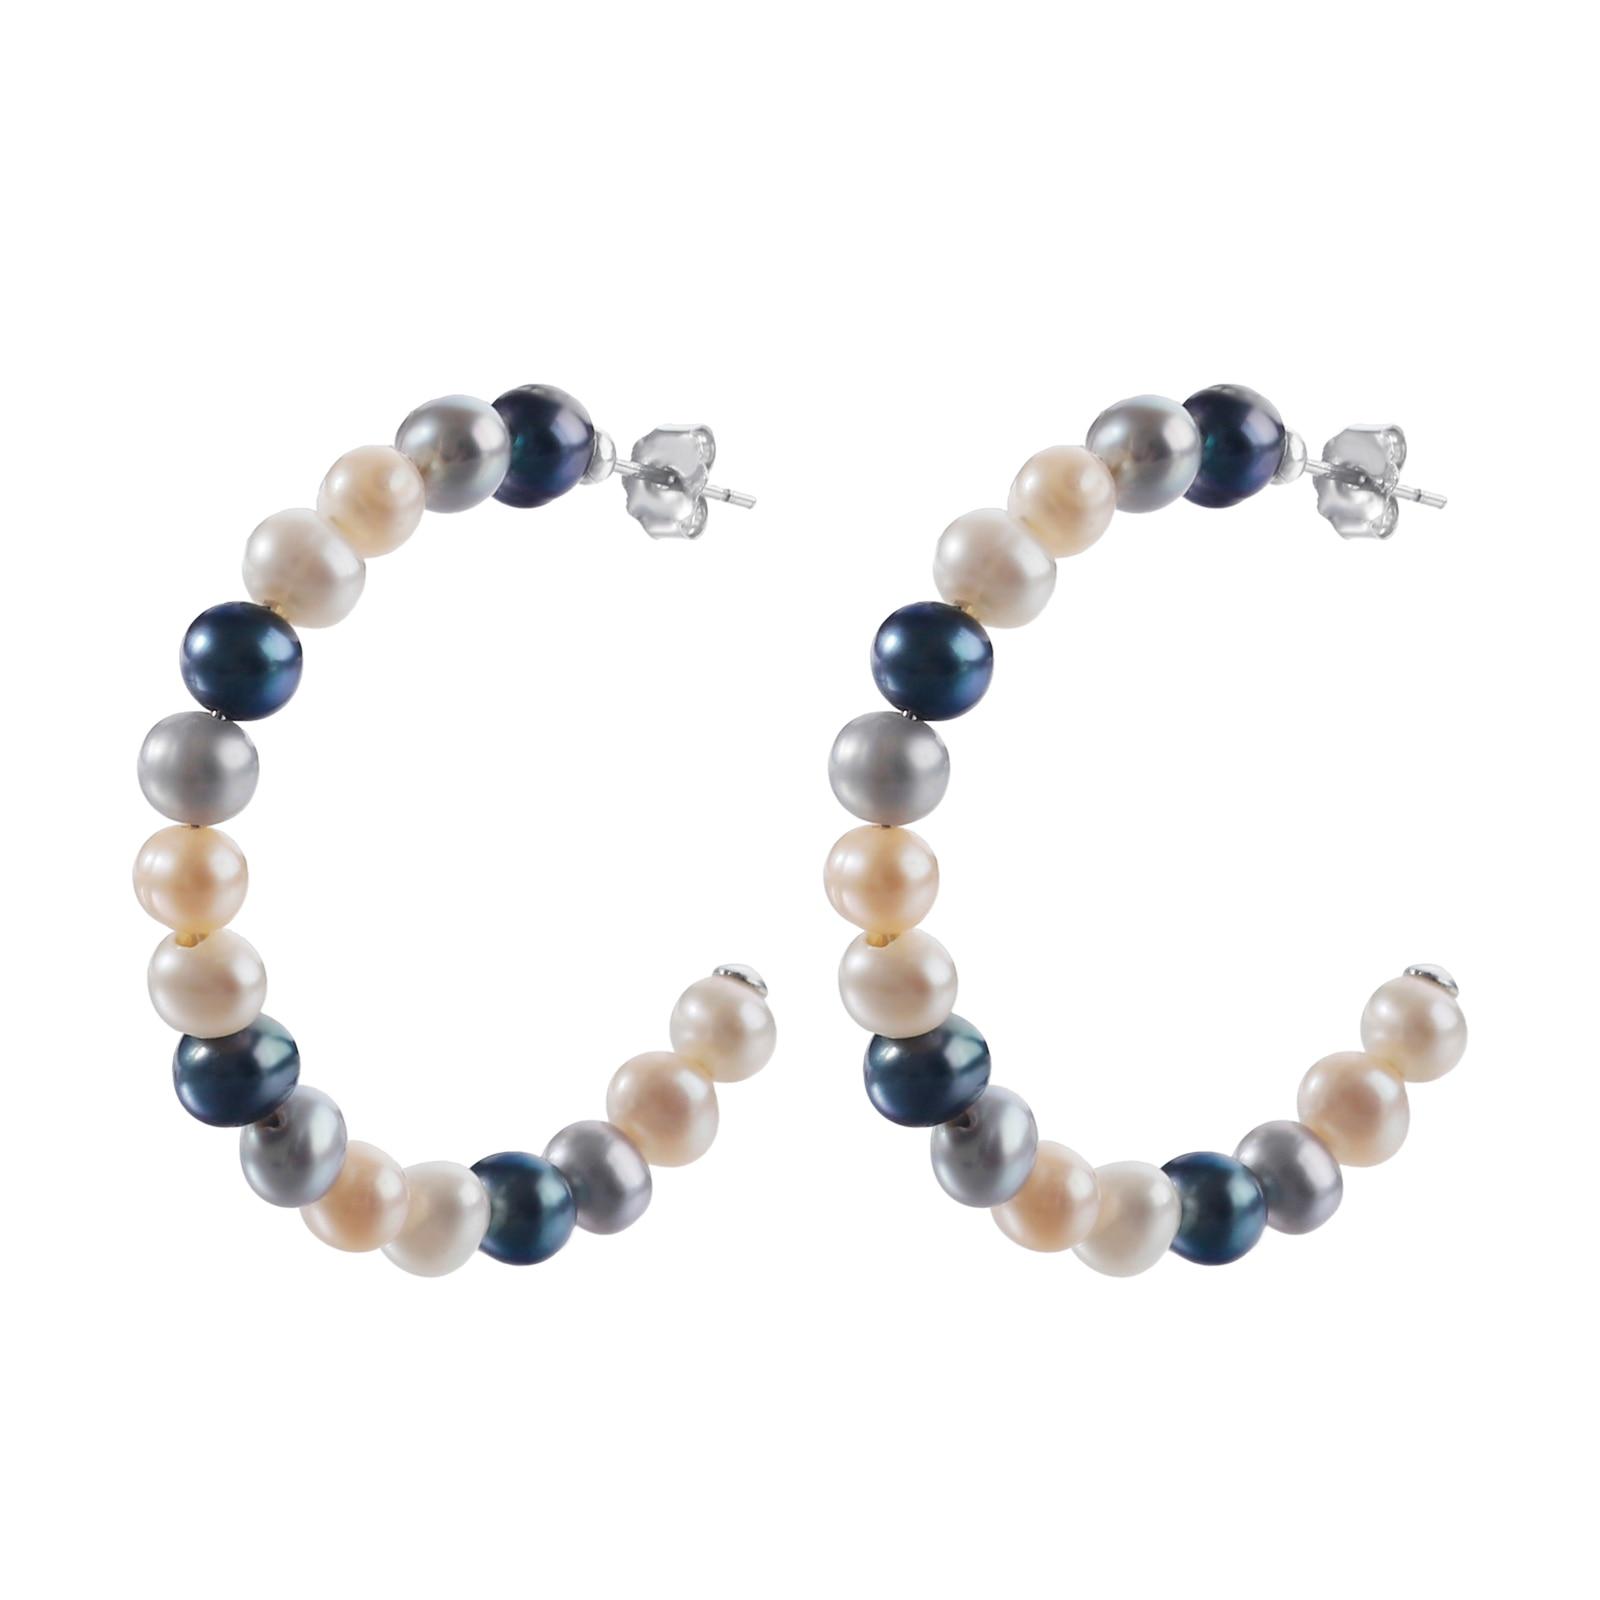 Hoop Earrings Natural Colorful Freshwater Pearl 925 Sterling Silver Large Circle Earrings for Women